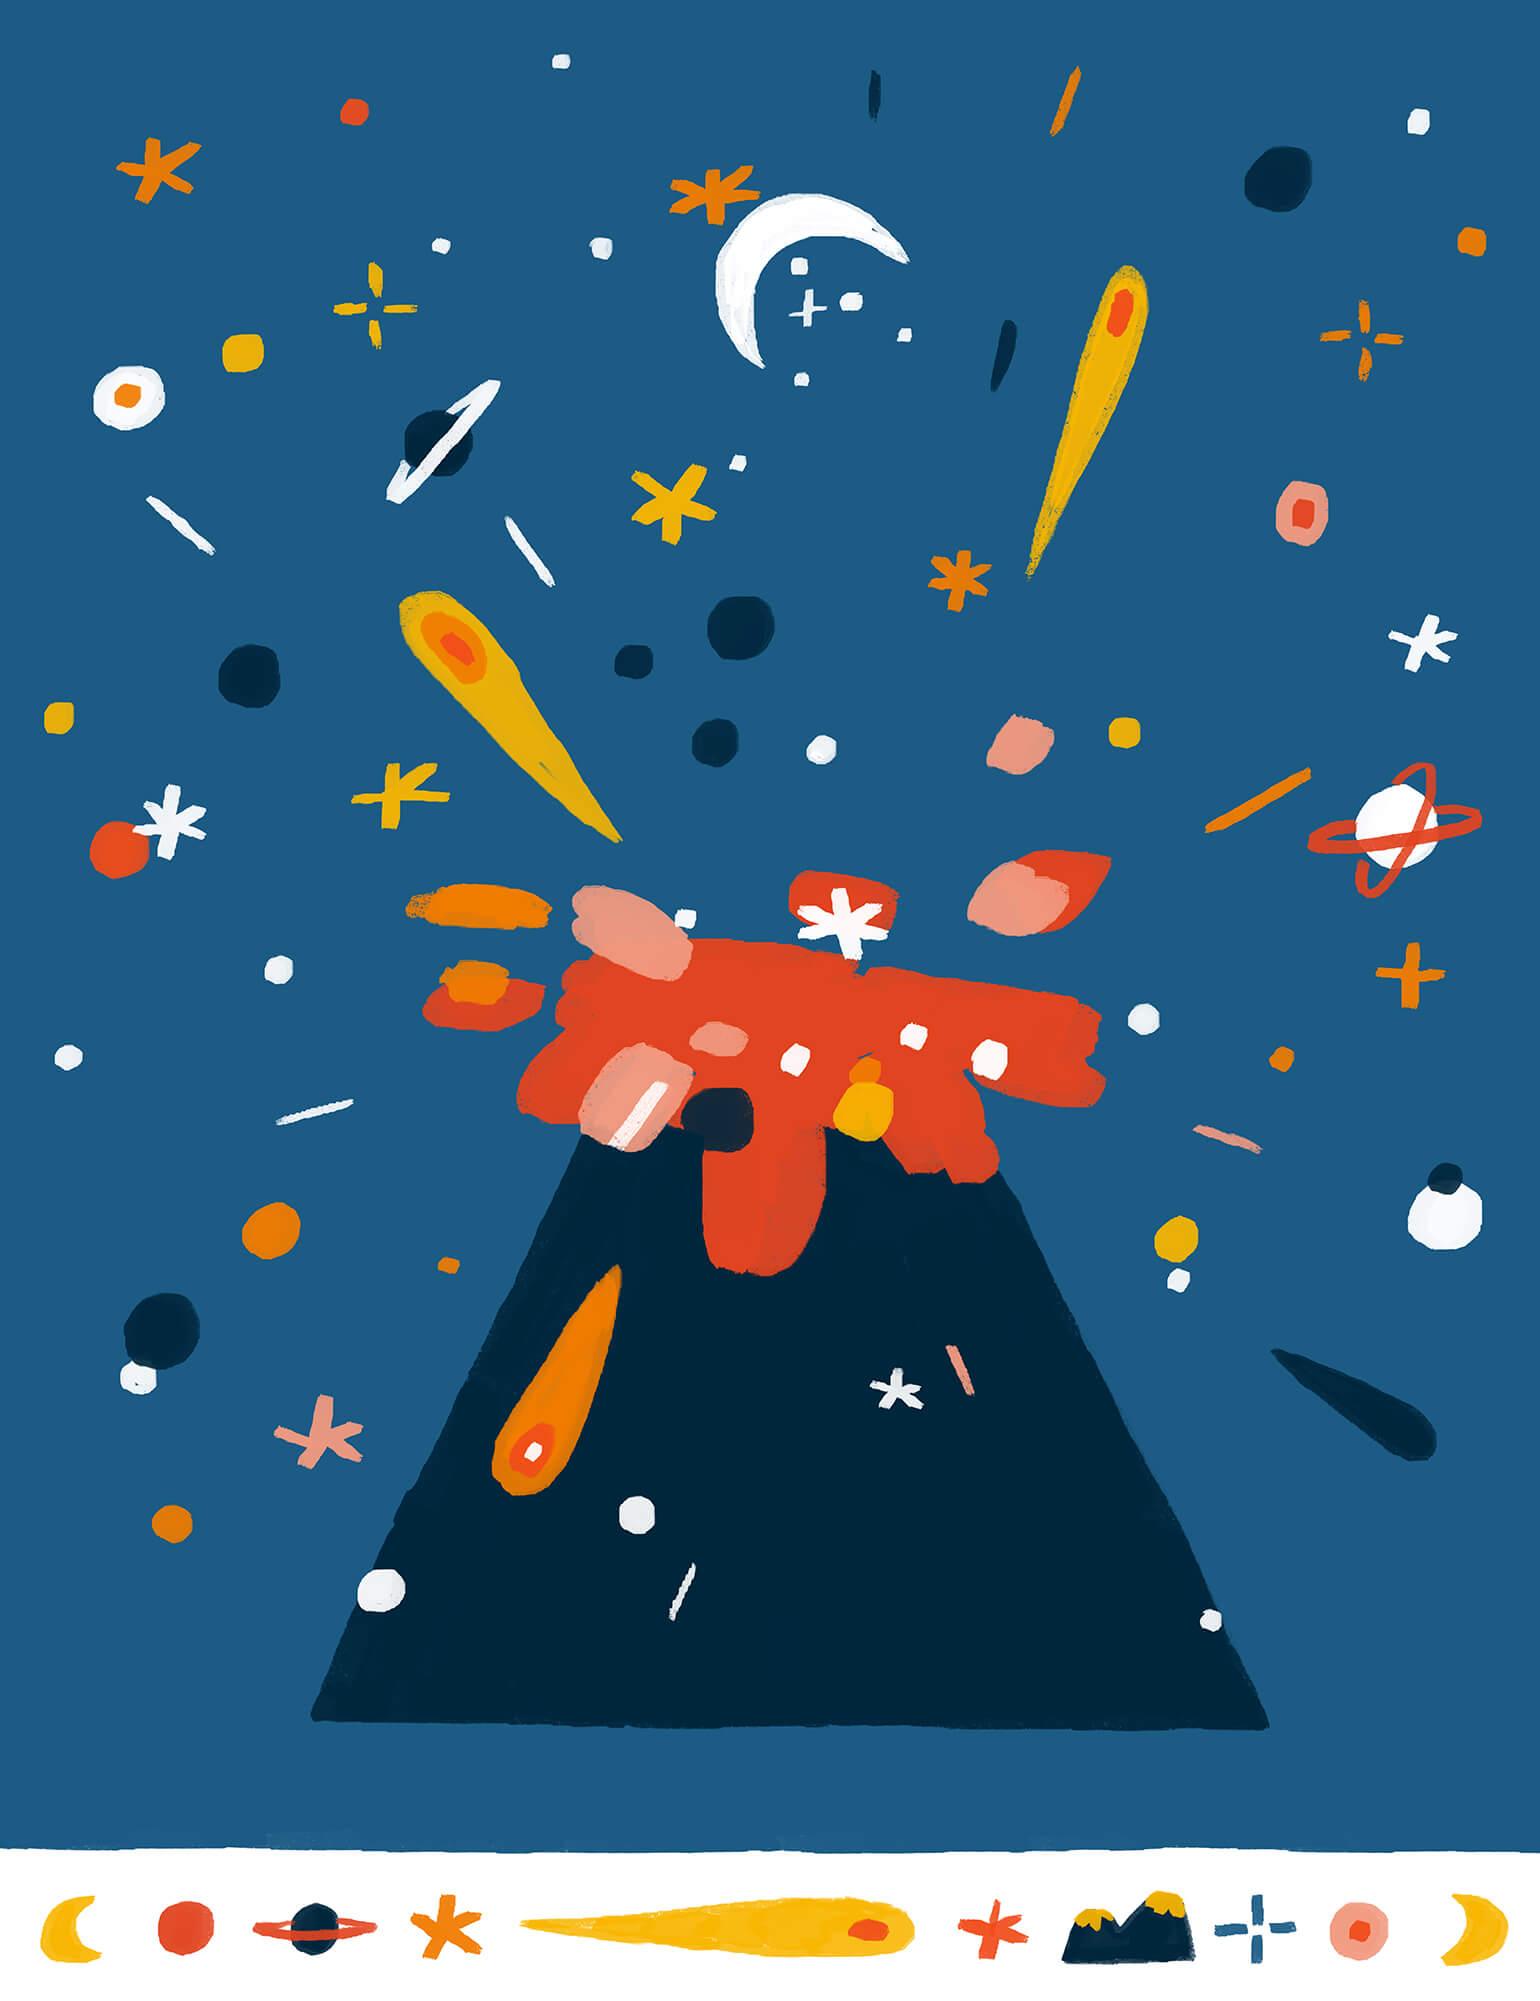 universe-volcano-stars-asteroid-violeta-noy